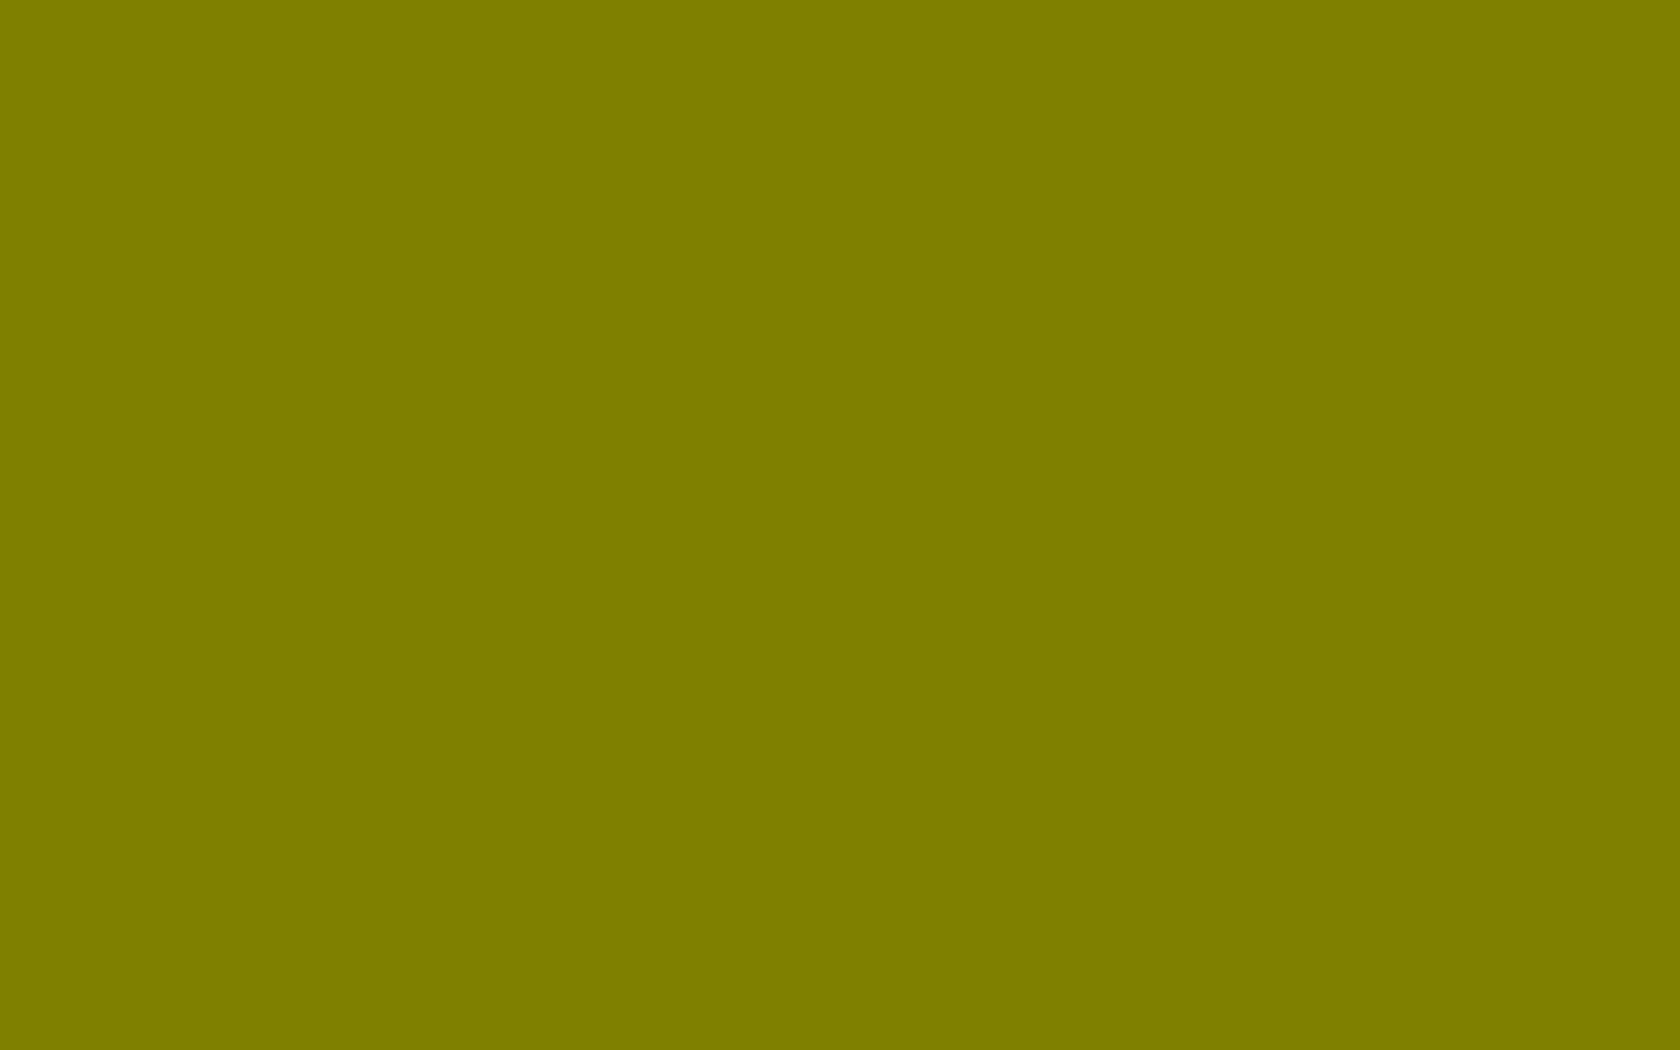 1680x1050 Olive Solid Color Background